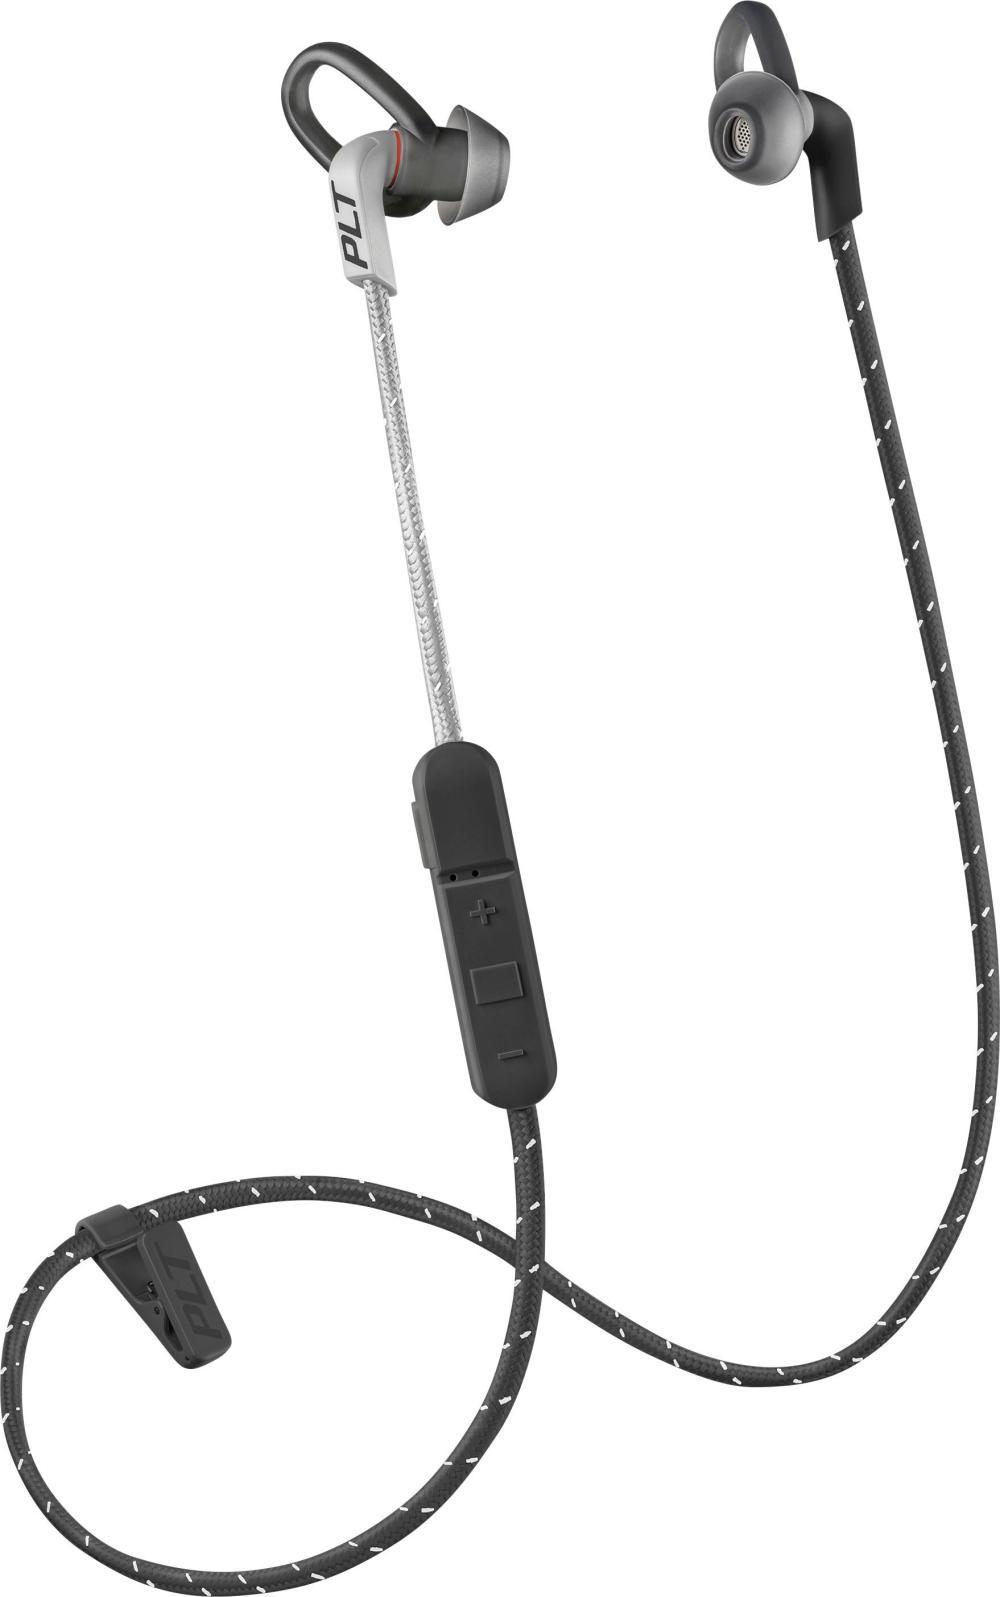 medium resolution of best buy plantronics backbeat fit 305 wireless in ear headphones gray black 209058 63